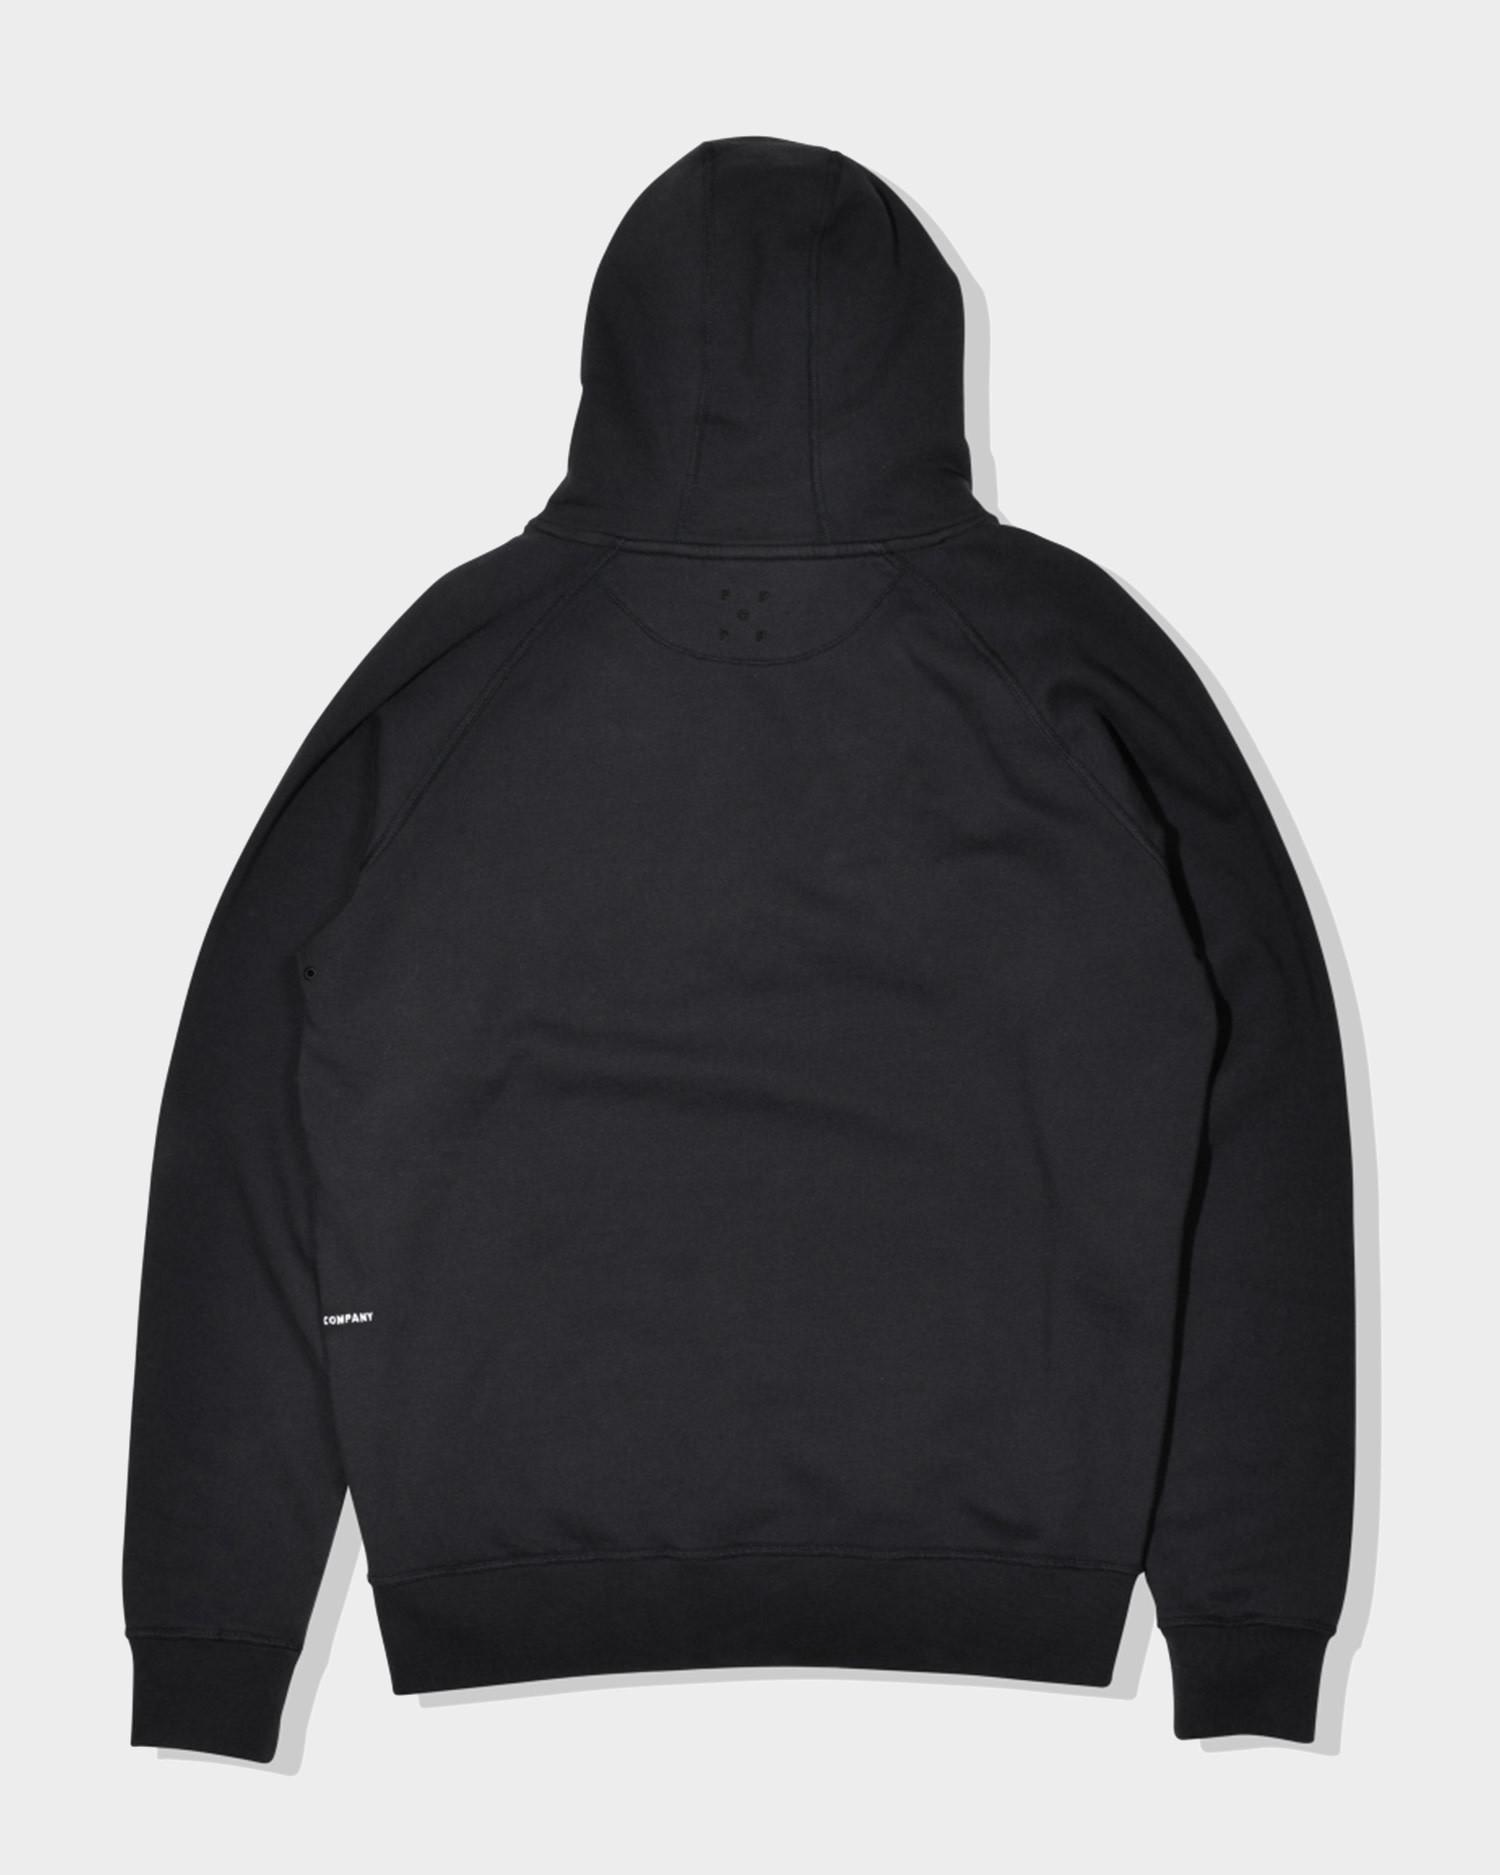 Pop Trading Co X Miffy Hooded Sweat Black